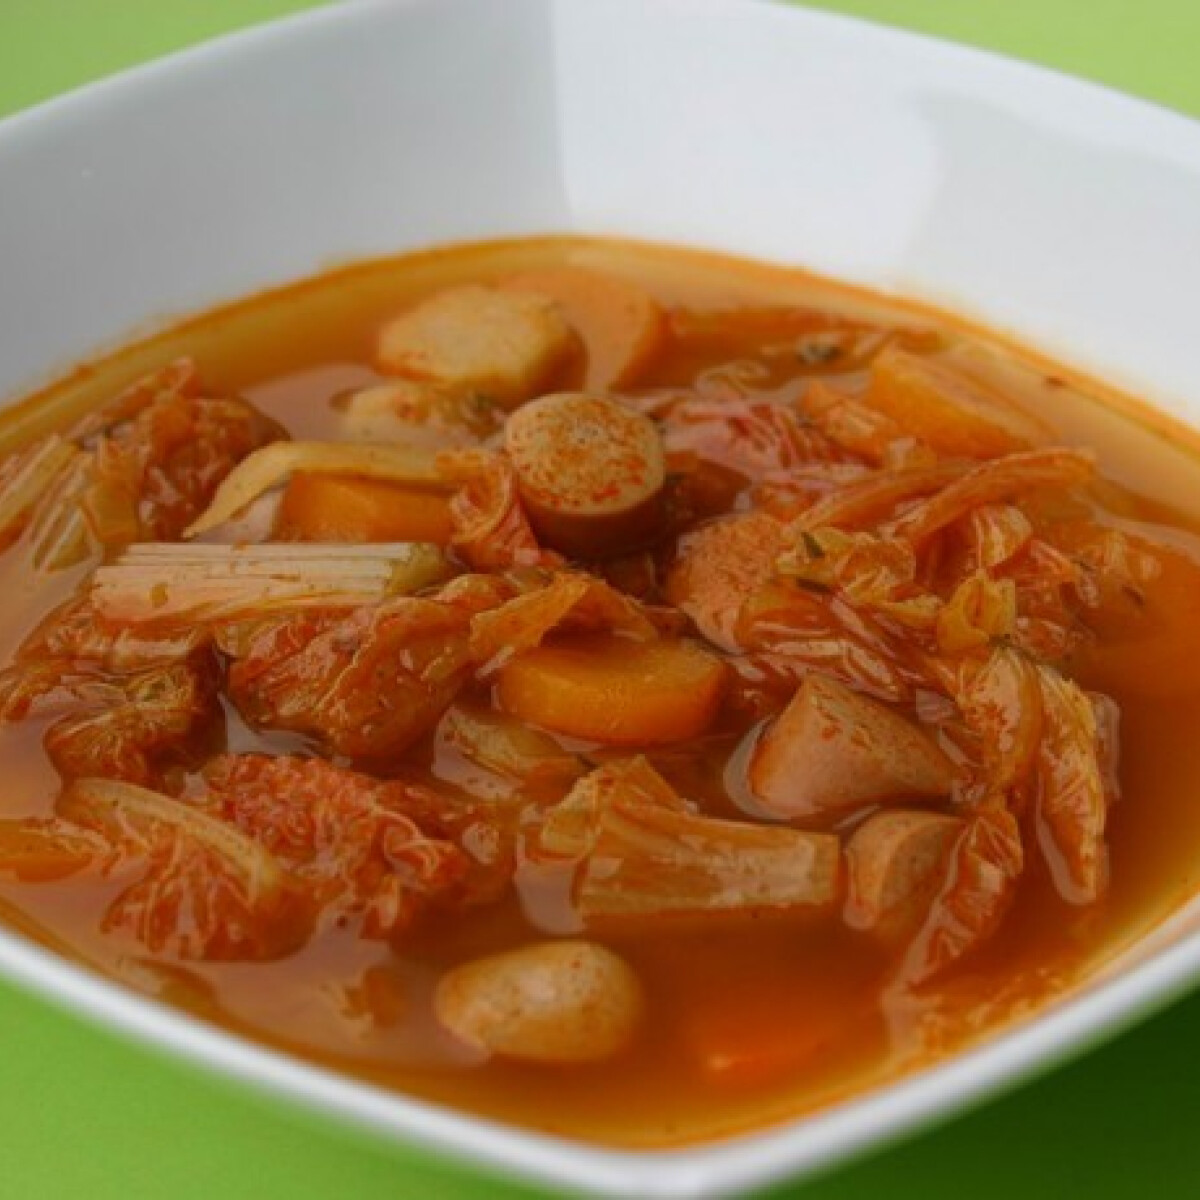 Virslis kínaikel-leves